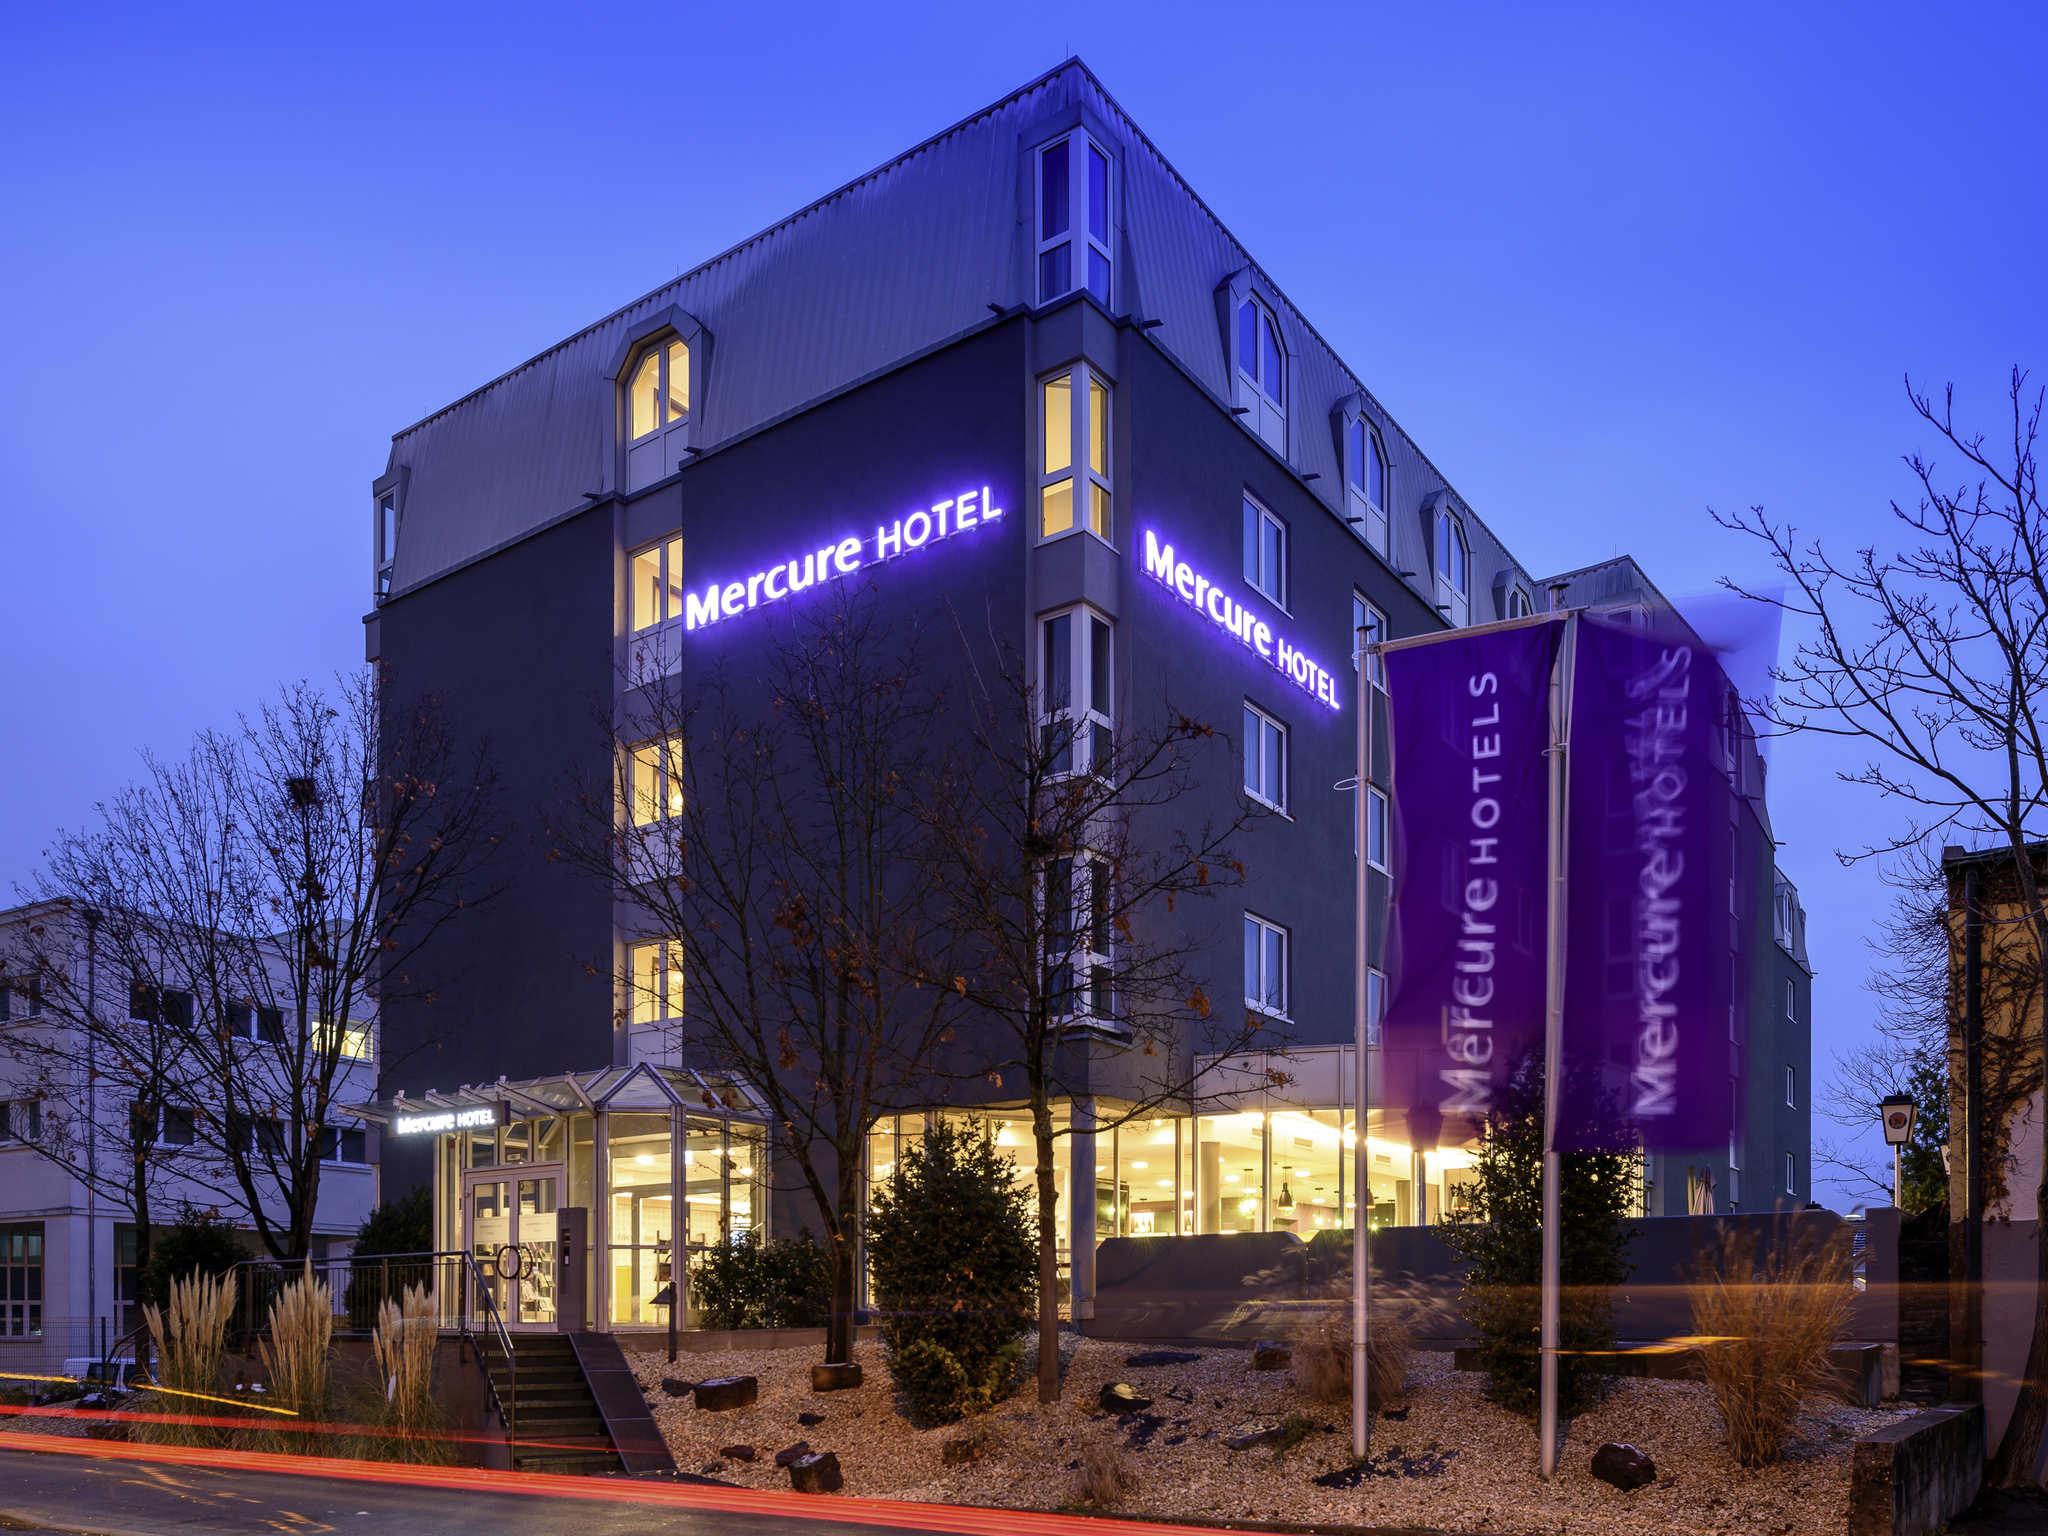 Hotel – Mercure Hotel Stuttgart Zuffenhausen (opening: augustus 2017)